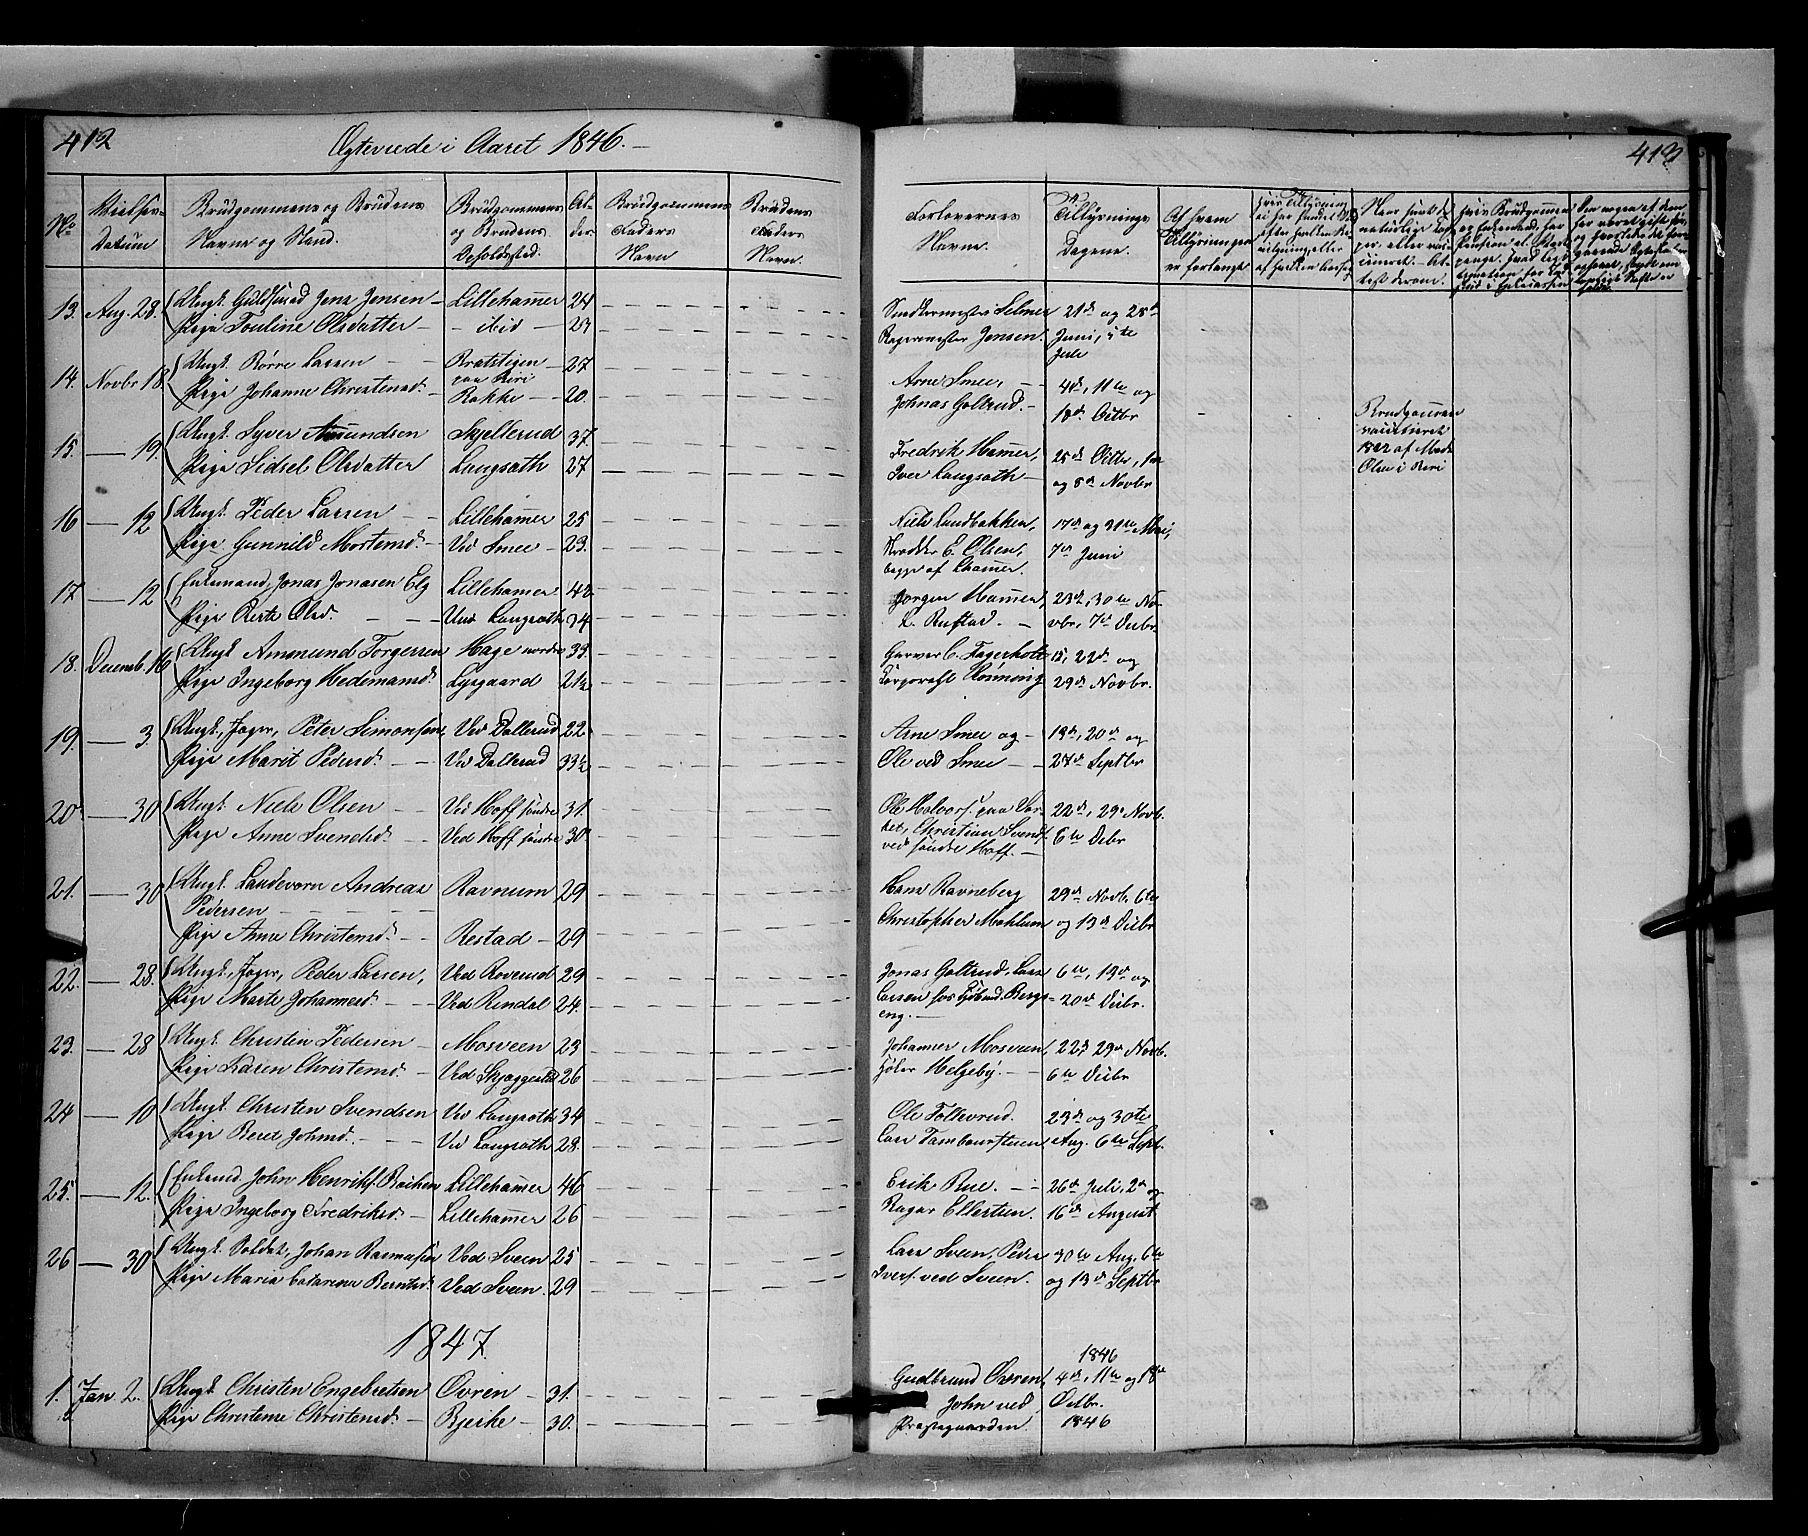 SAH, Fåberg prestekontor, Klokkerbok nr. 6, 1837-1855, s. 412-413